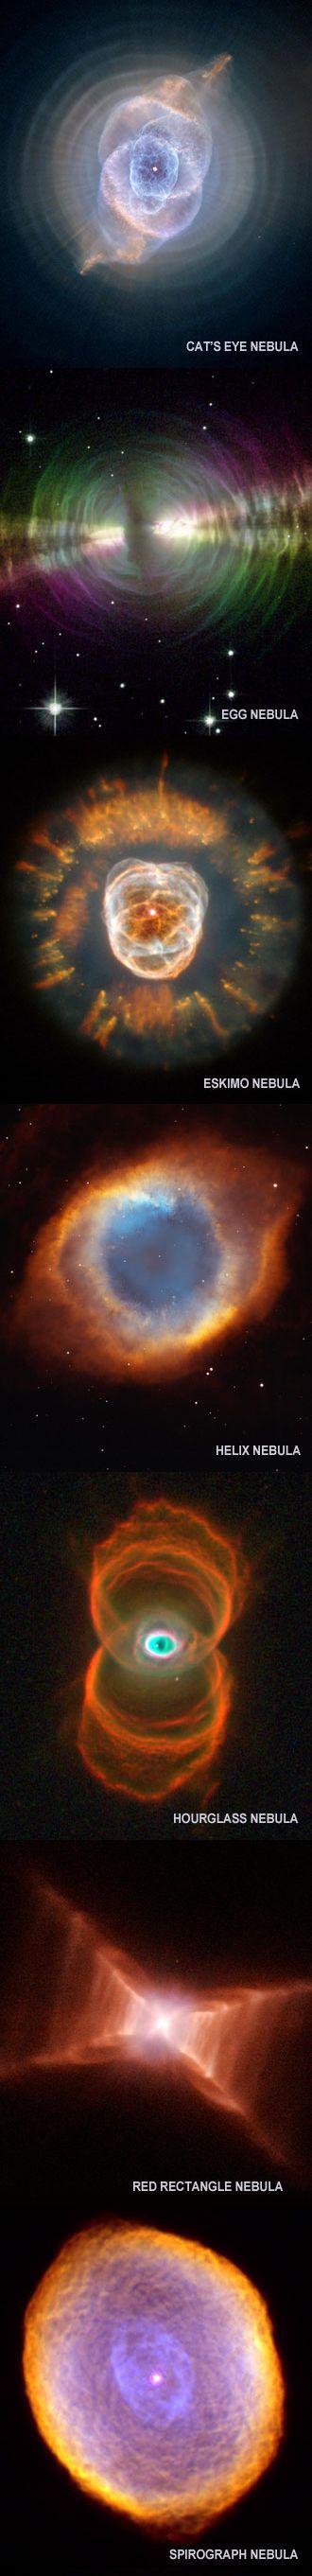 http://hubblesite.org/hubble_discoveries/breakthroughs/galactic